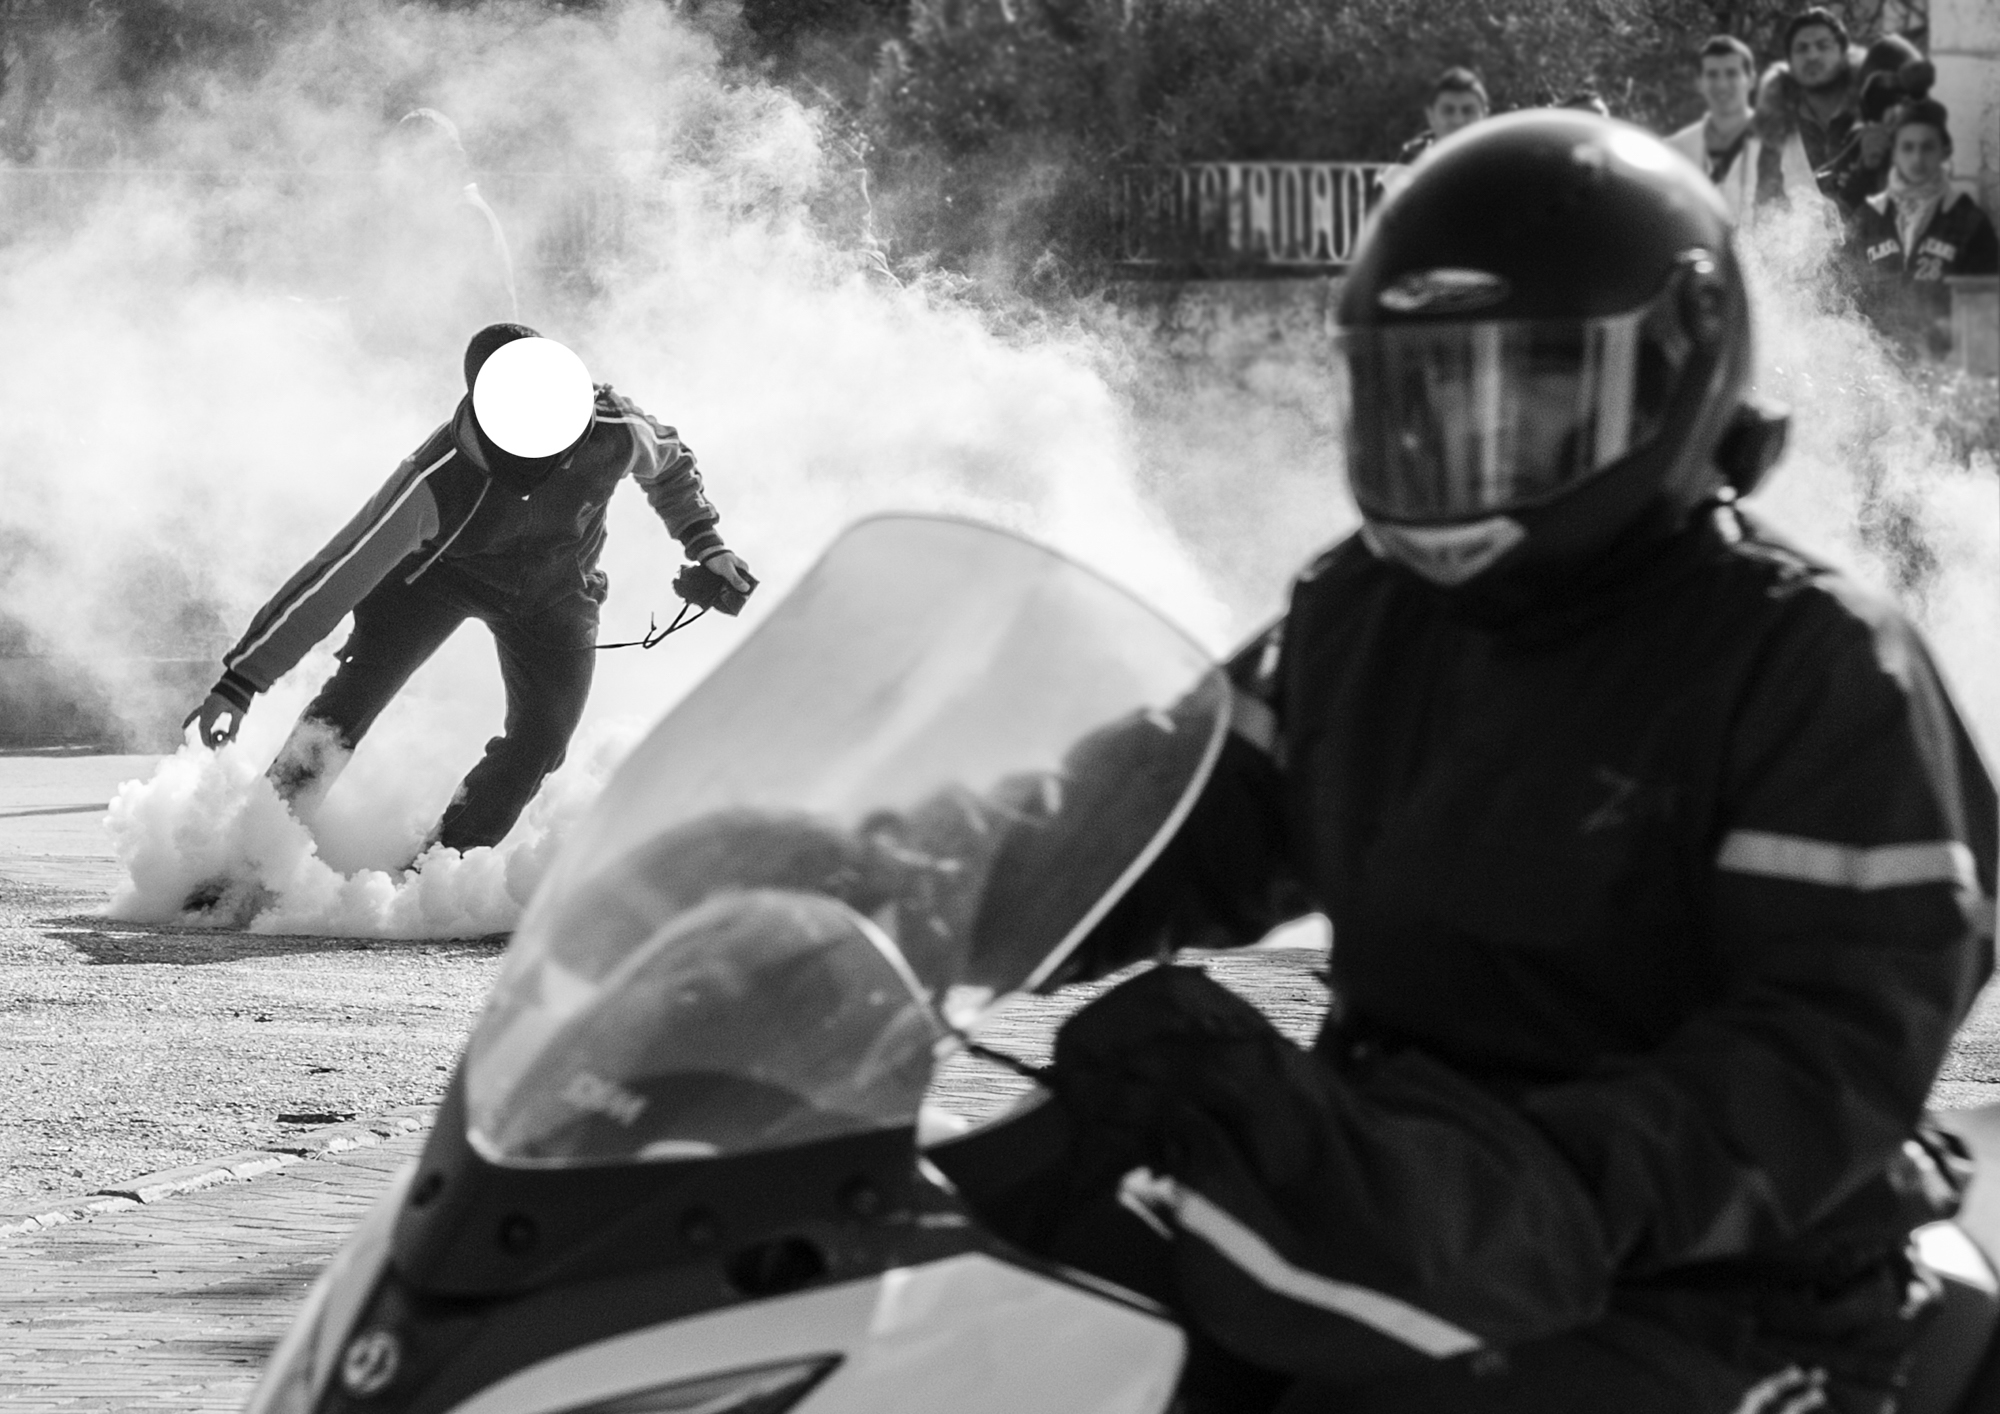 41b. Friday clashes copy